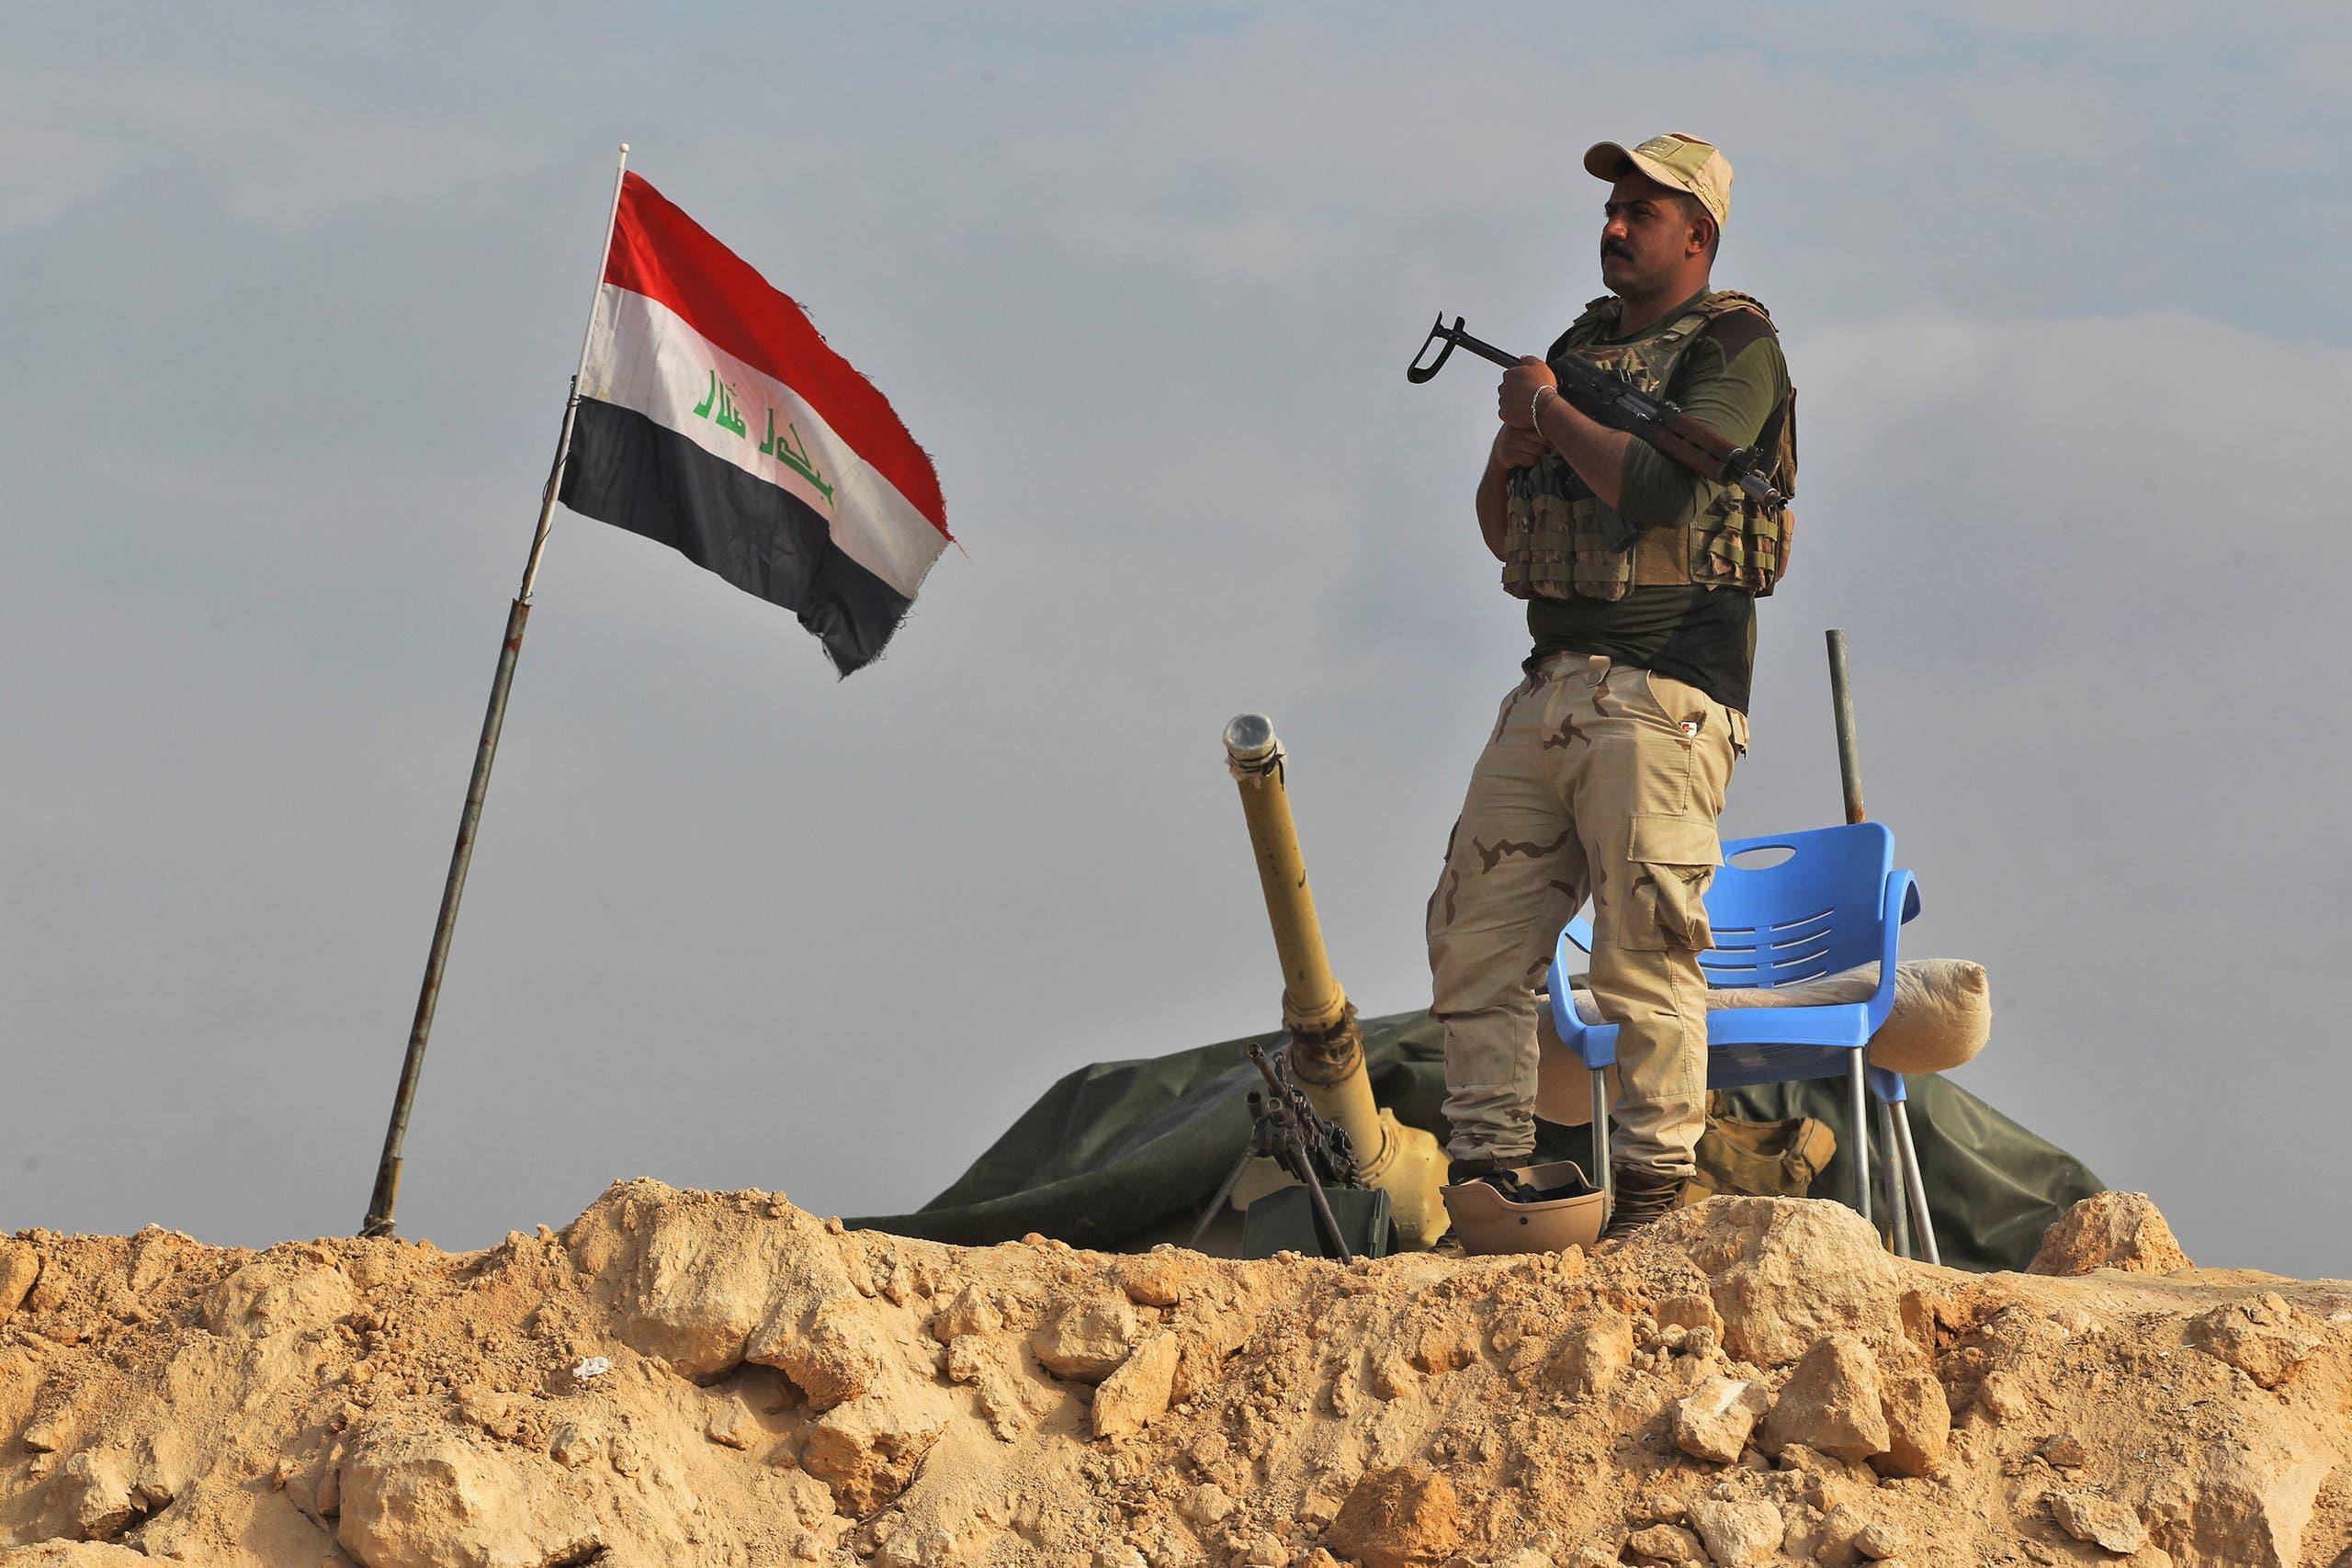 An Iraqi soldier stands guard near the Iraqi city of Qaim at the Iraqi-Syrian border. (File photo)